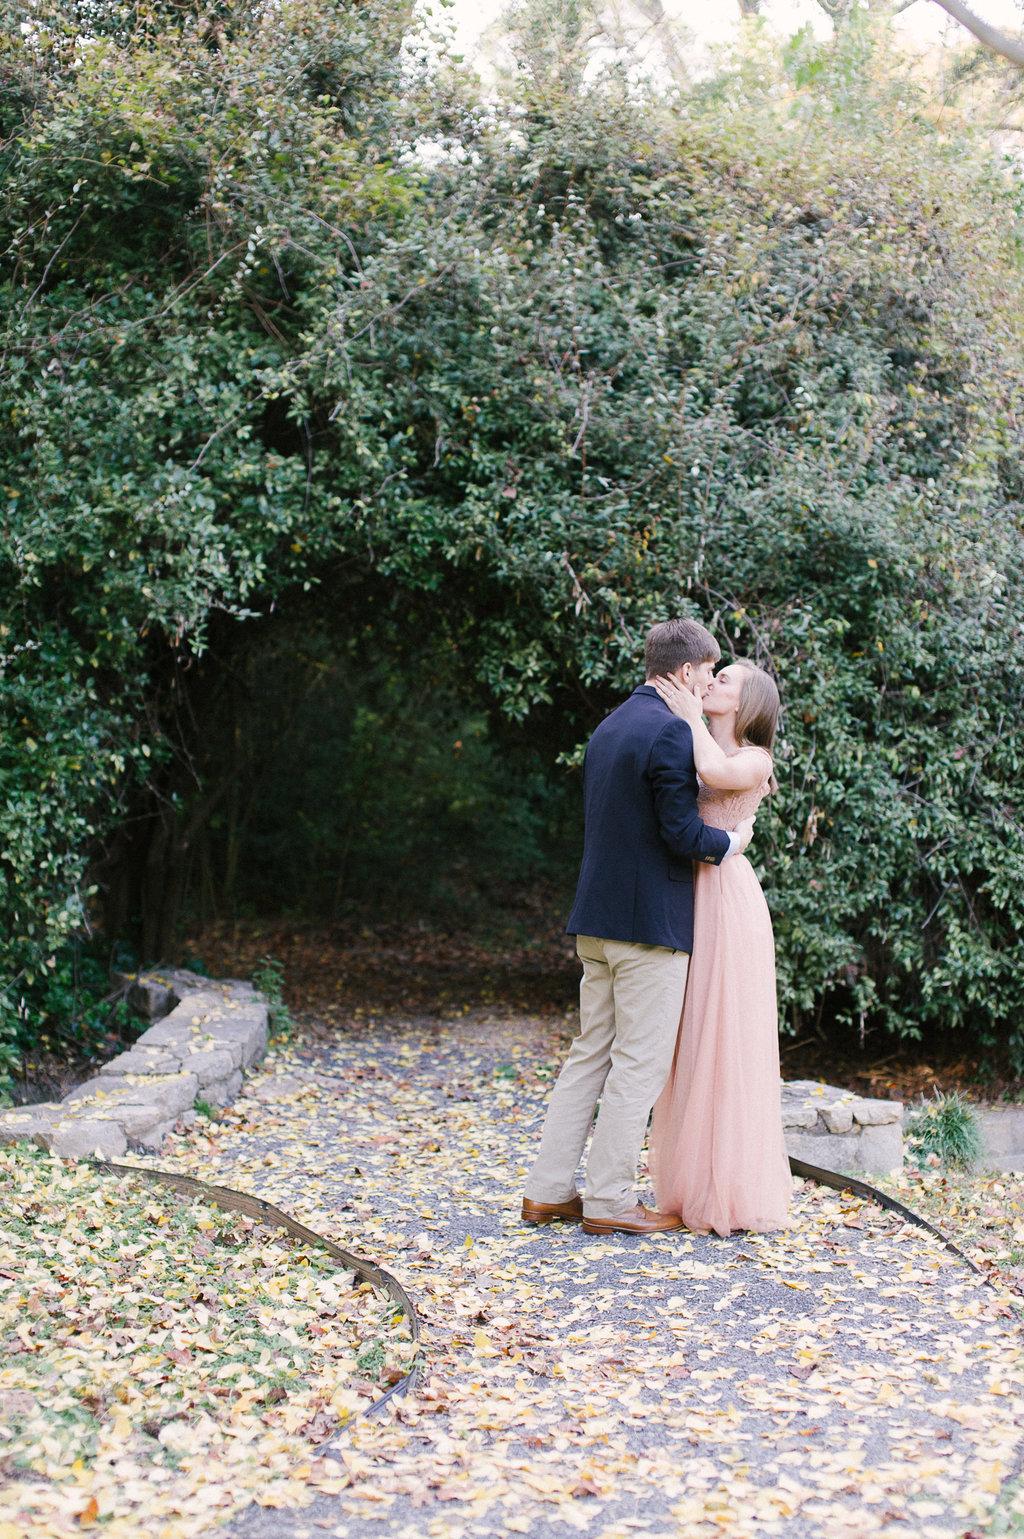 Cator-woolford-gardens-wedding-photography-hannah-forsberg-atlanta-2.jpg